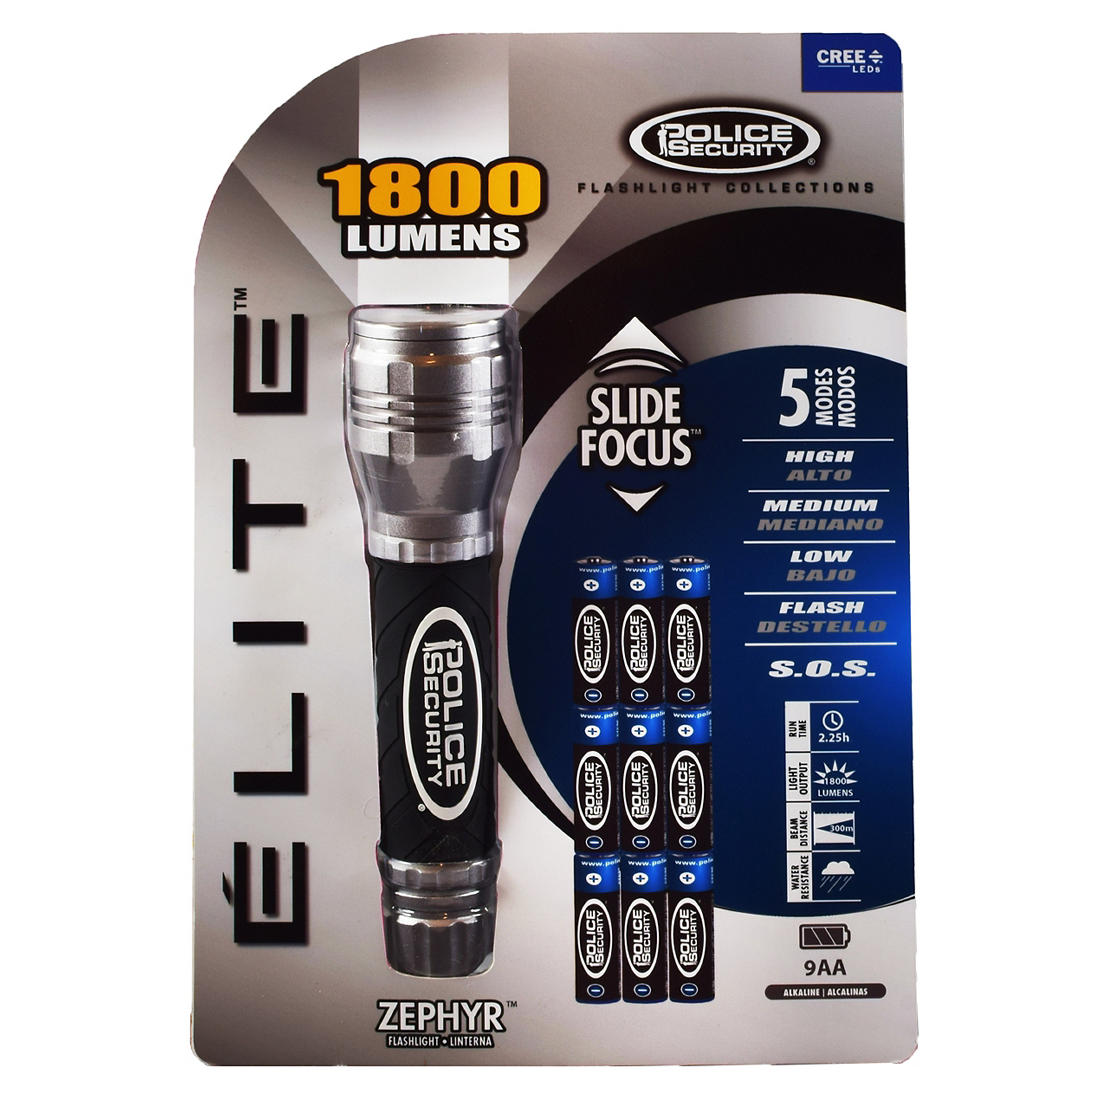 Police Security Elite 1,800-Lumen Ultra Bright Flashlight